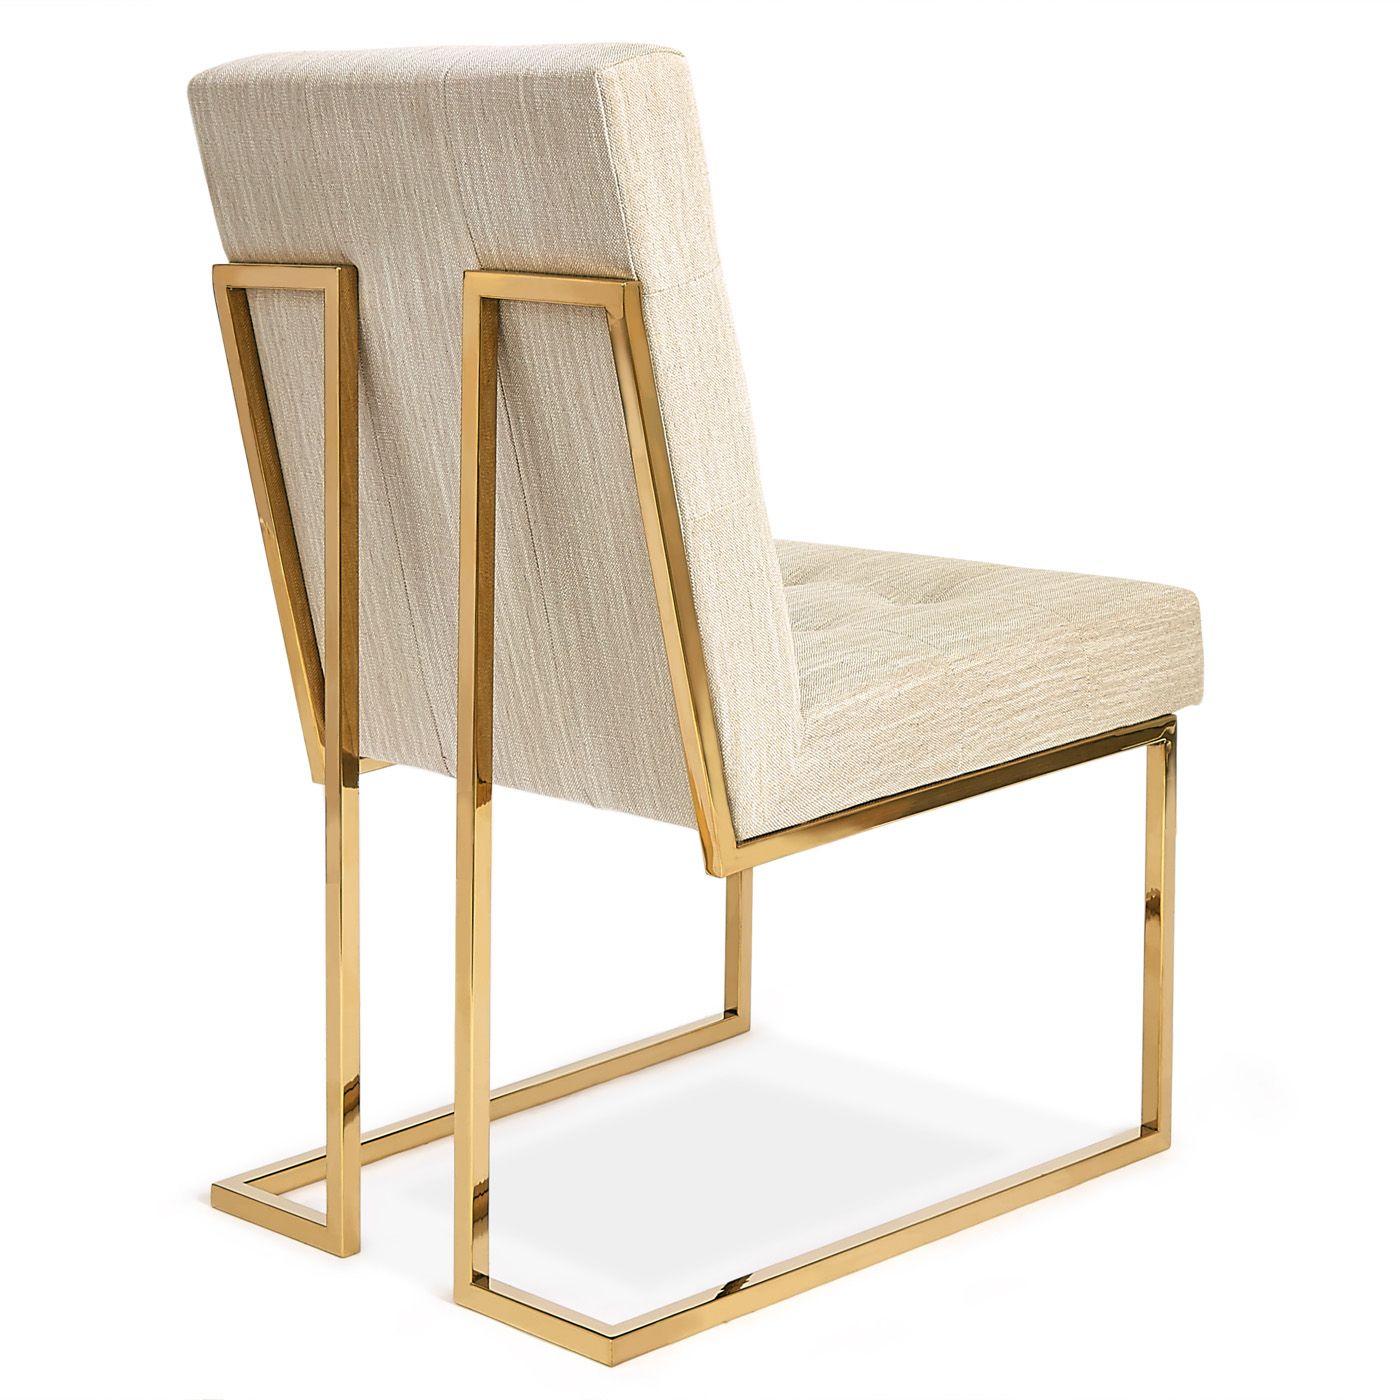 Jonathan Adler, Goldfinger Dining Chair | Outdoor dining ...